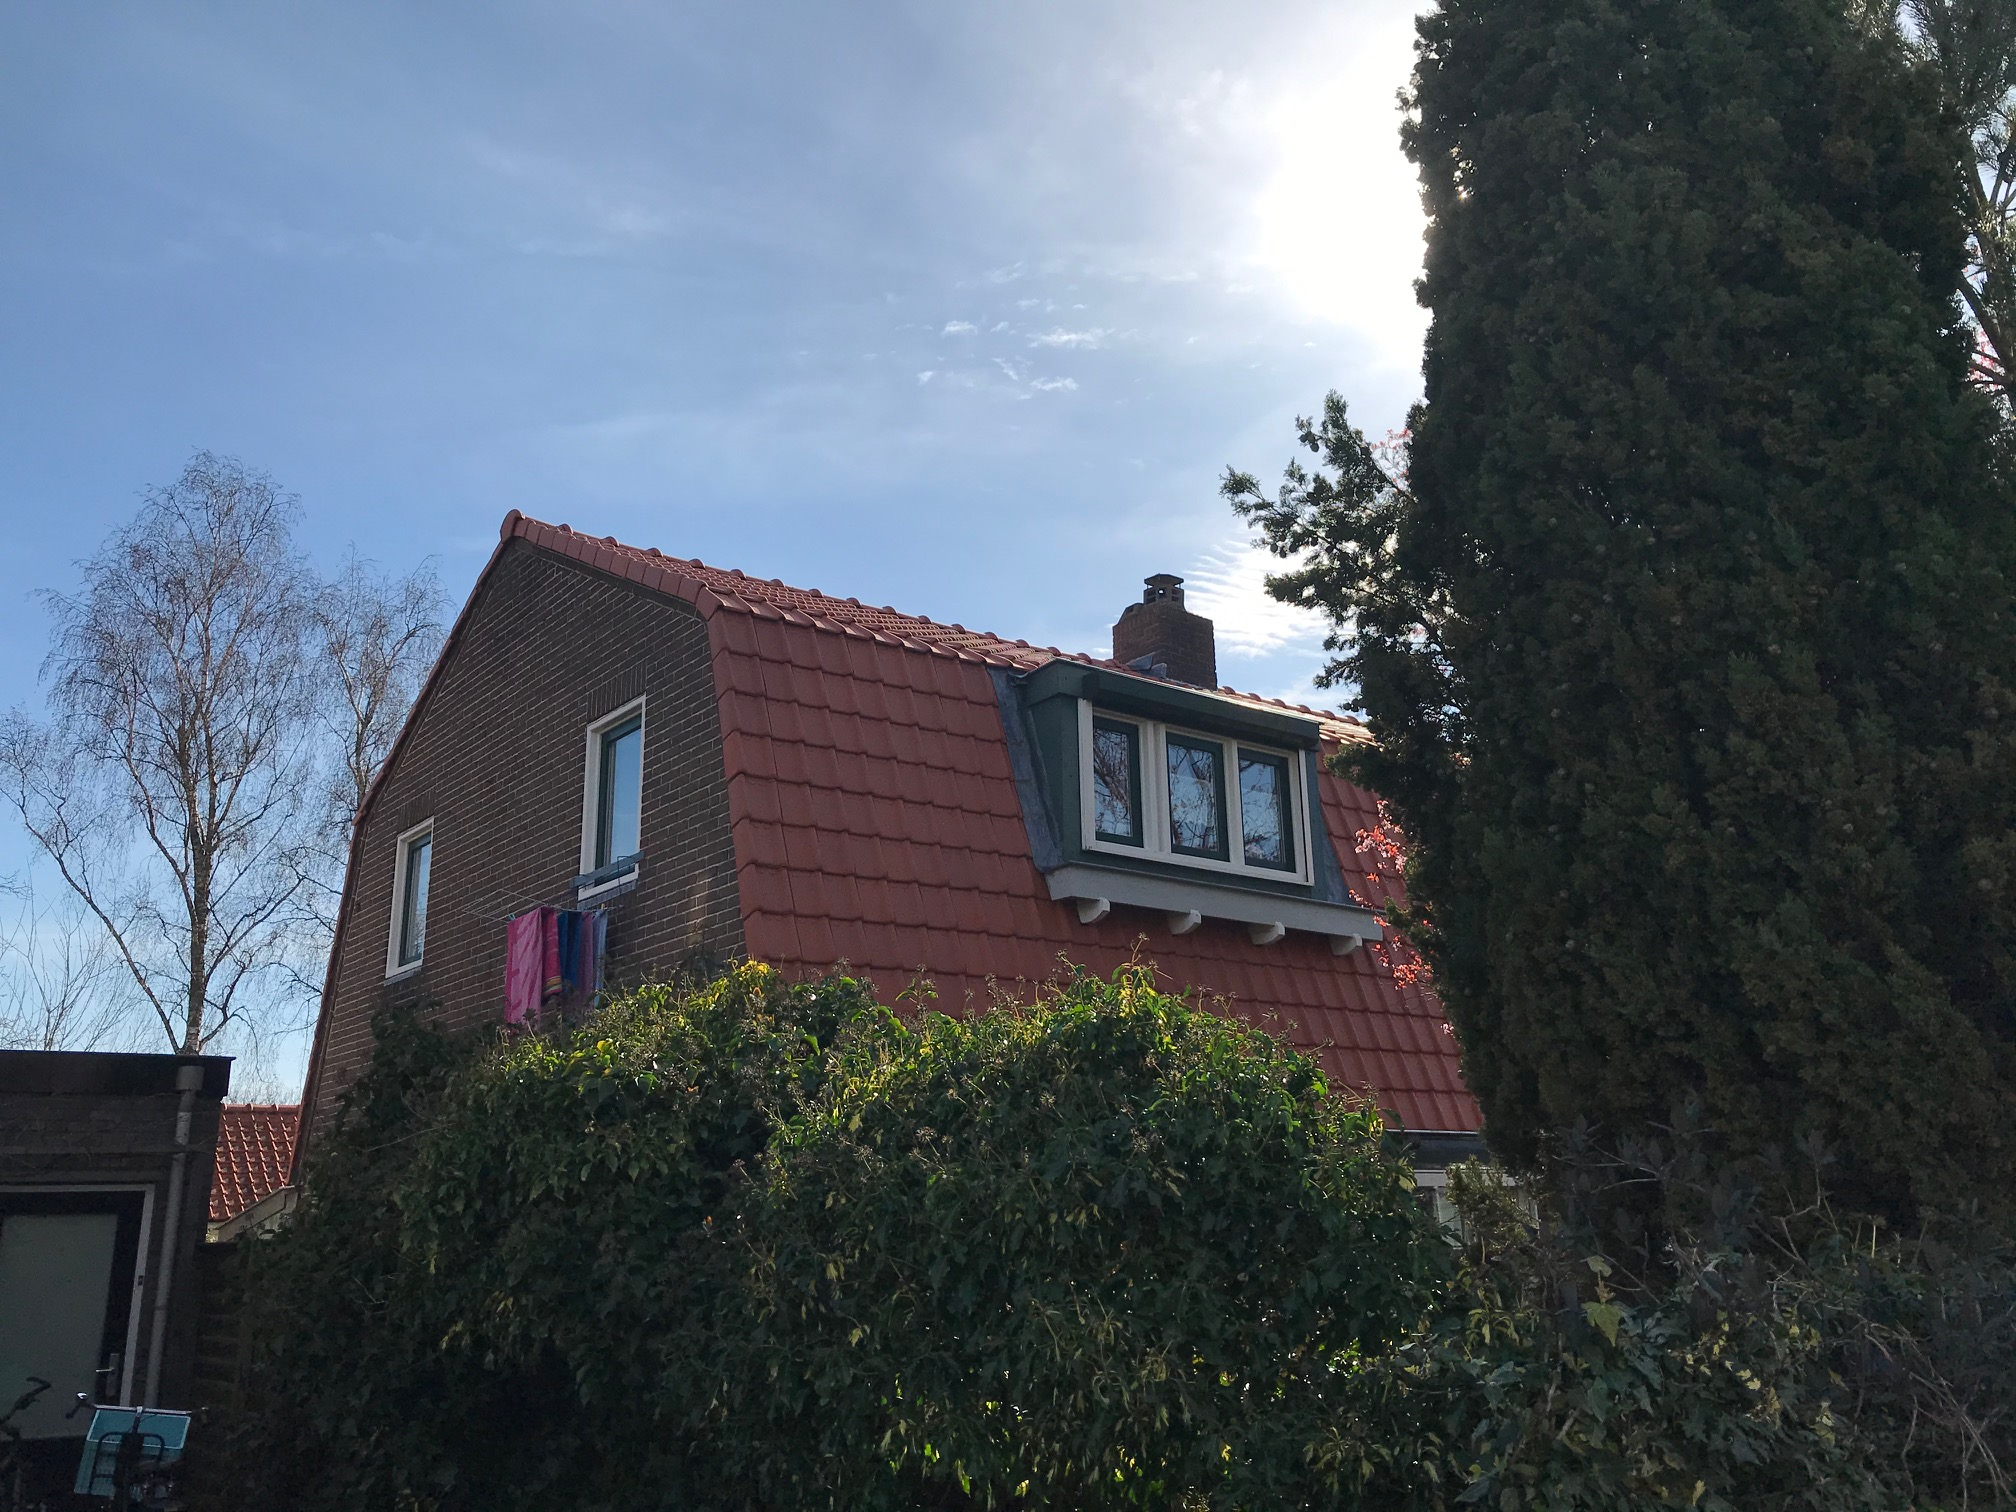 dak renovatie kapelweg Amersfoort